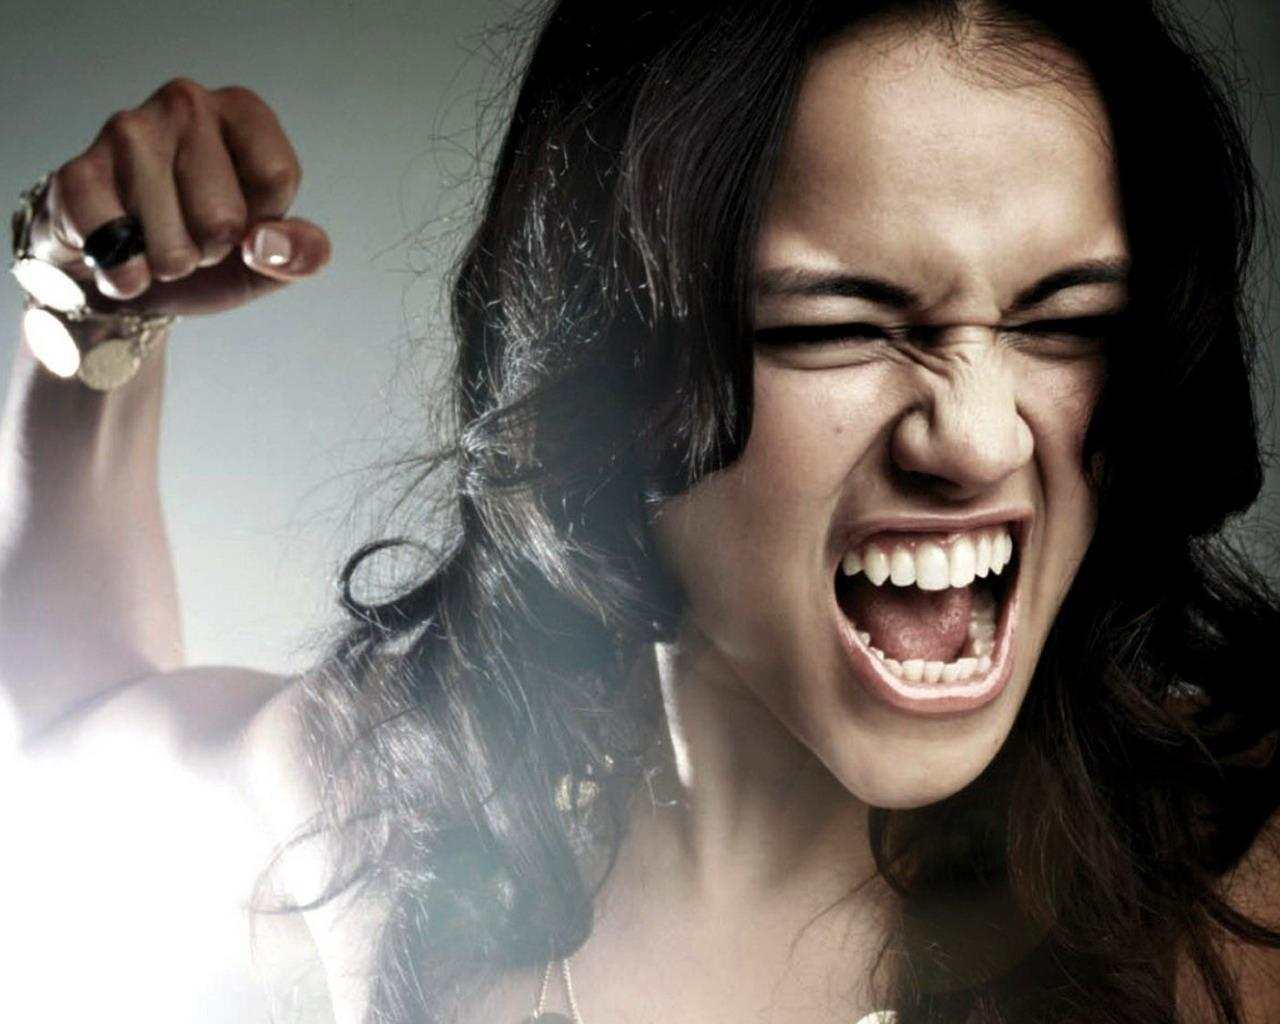 angrywoman Kultura kanalisanja nervoze